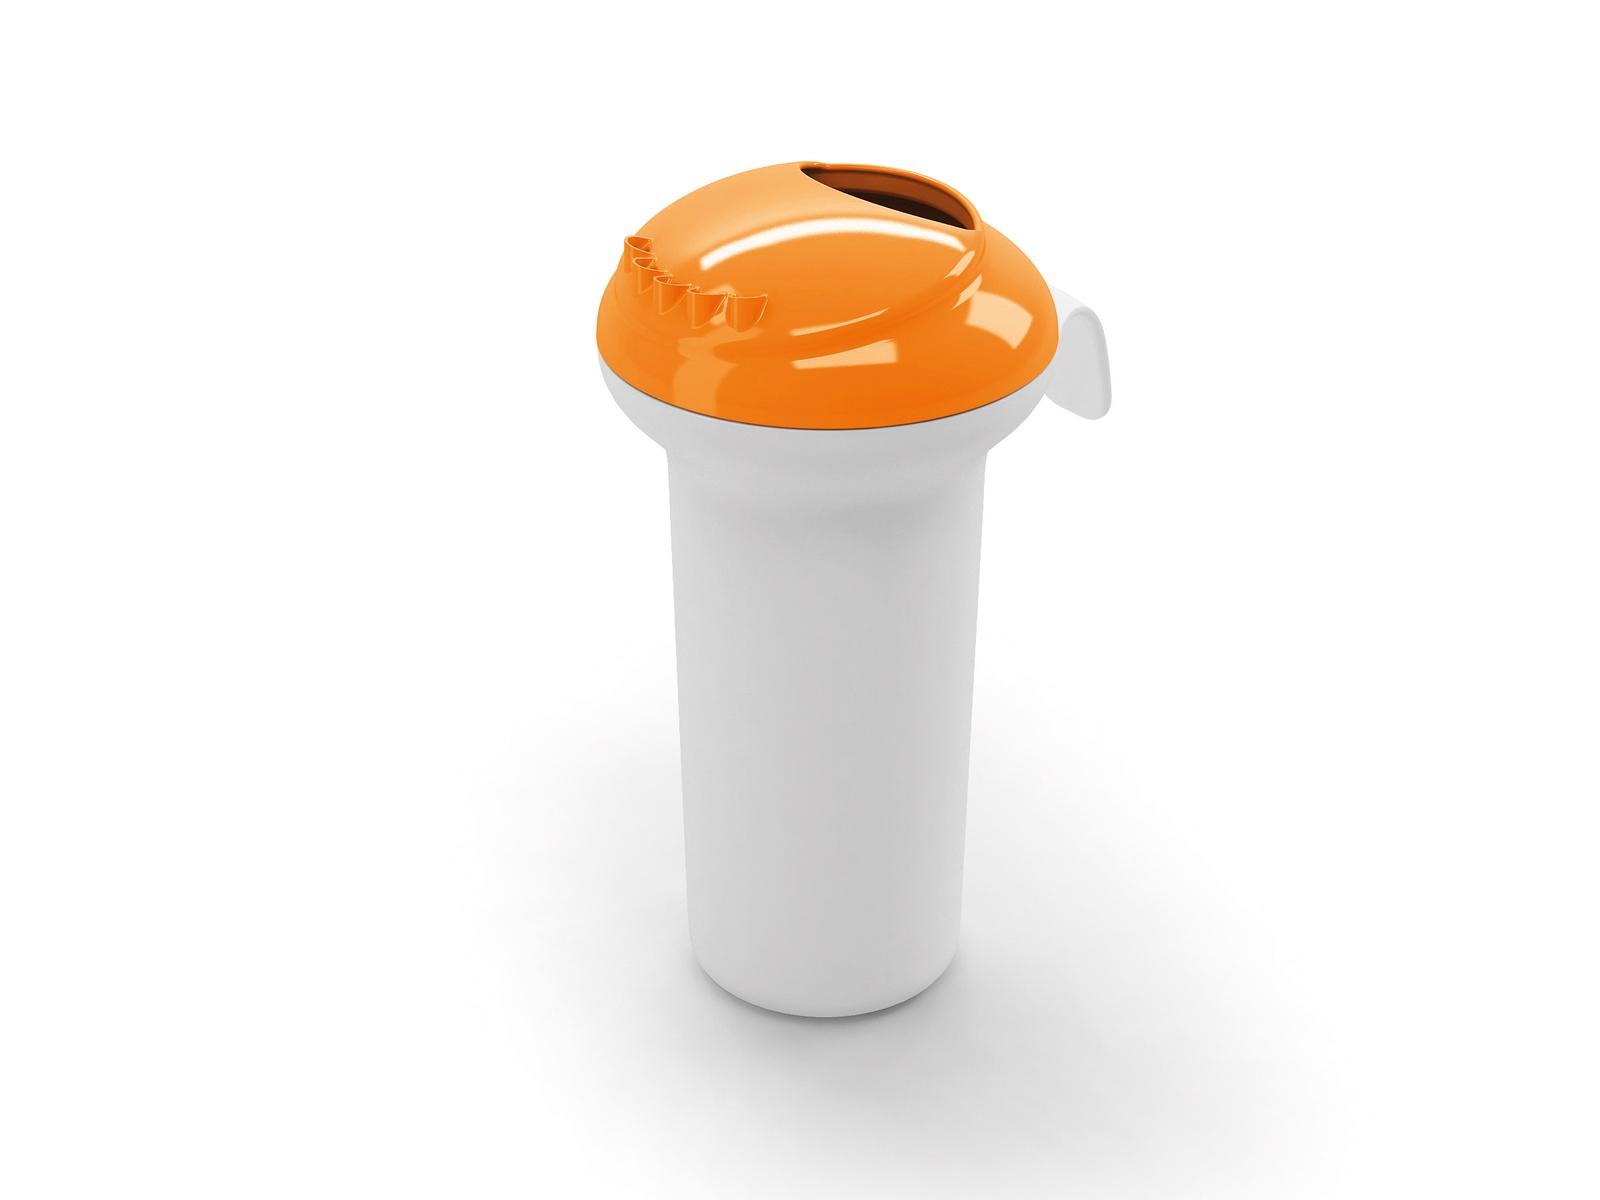 Ковш для бани OK BABY Splash, оранжевый ducka насадка на унитаз 785 оранжевый 45 ok baby